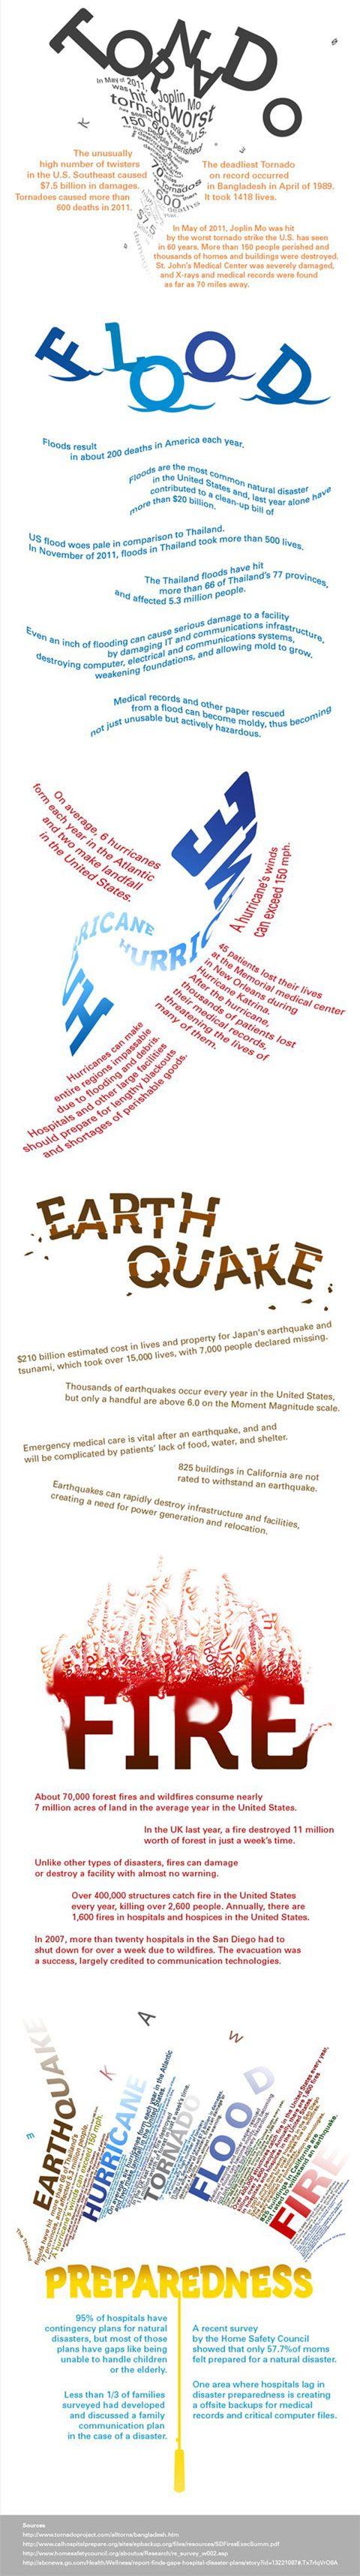 Natural disaster poster